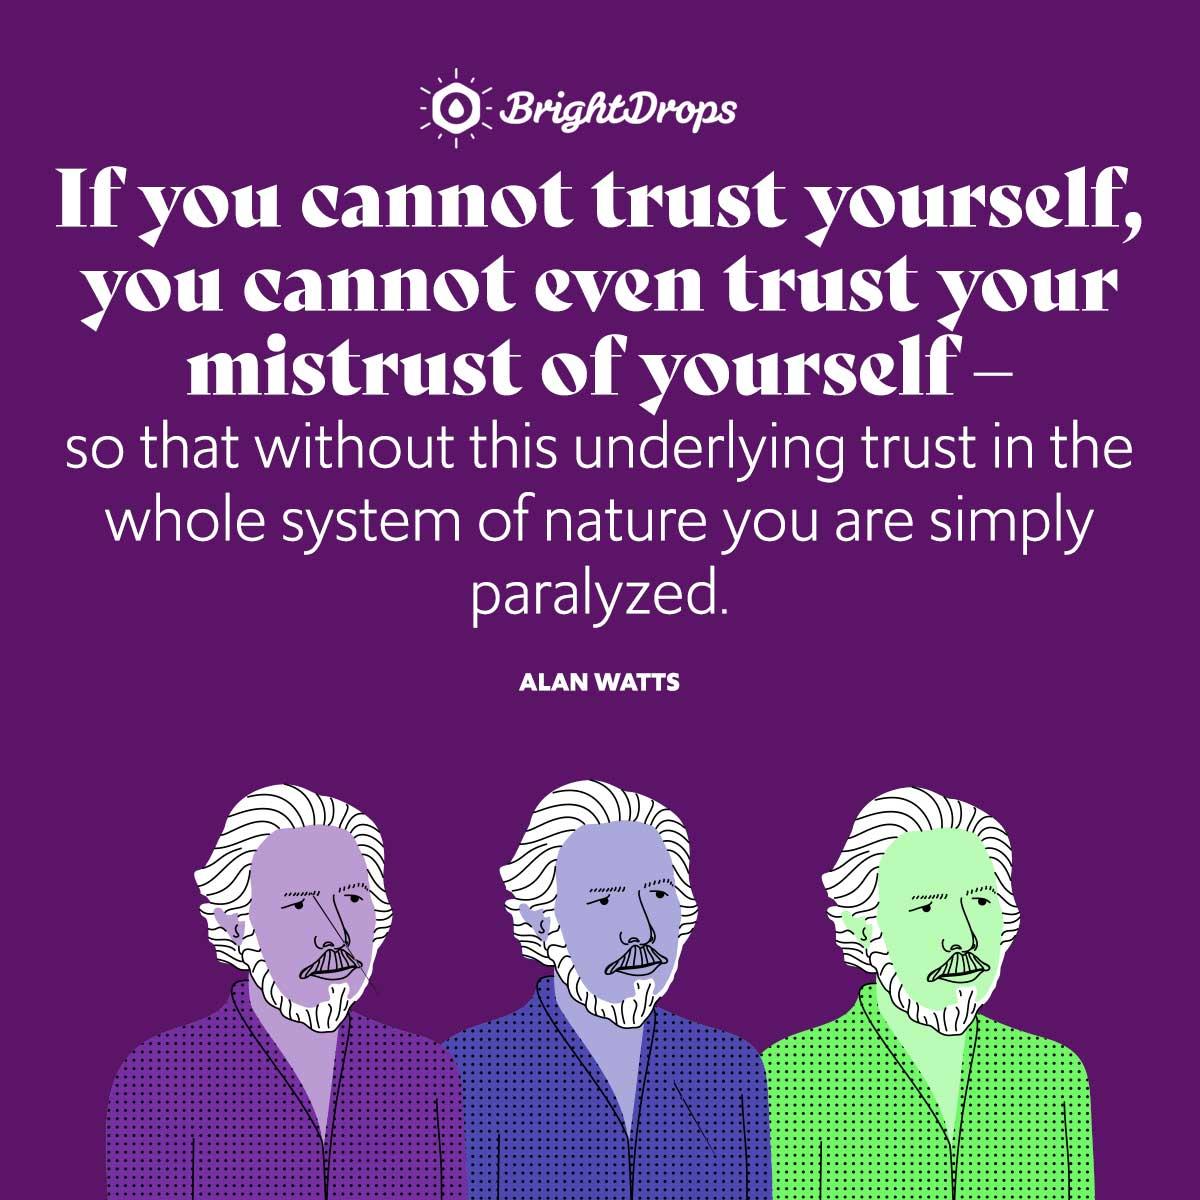 Alan Watts Quotes On Trust